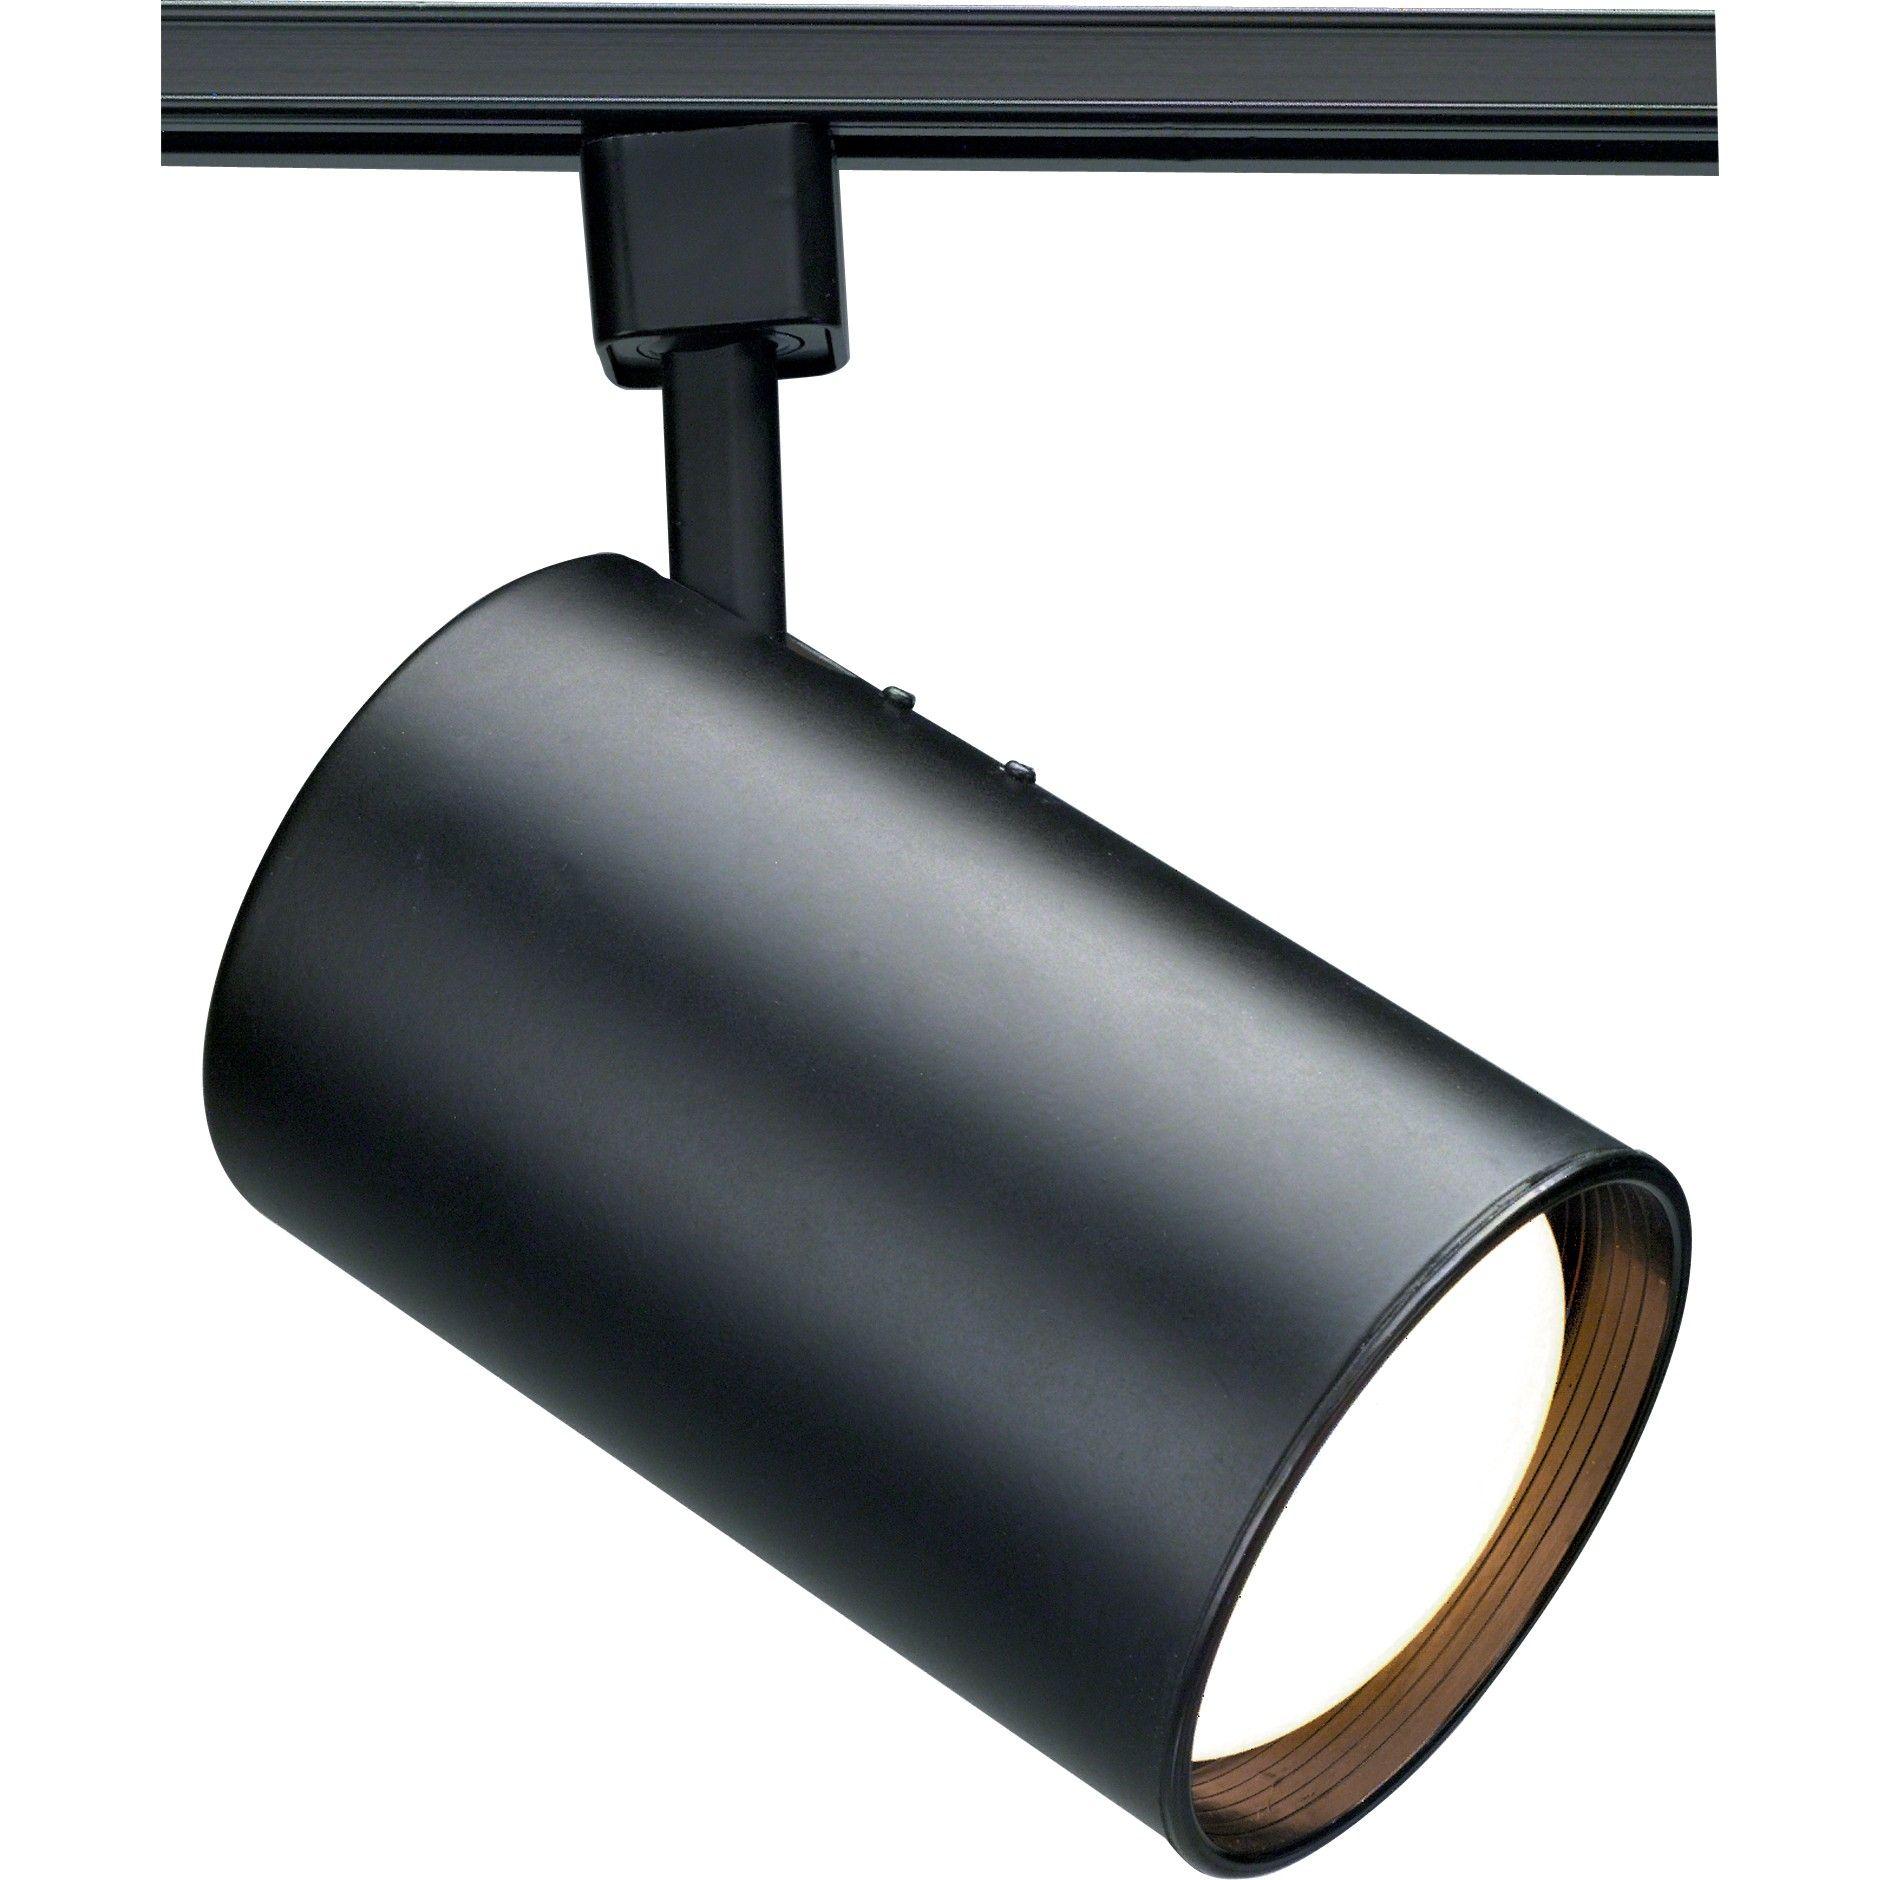 NUVO TH362 | 1-Light CFL R30 Straight Cylinder Track Lighting Head | NUVO Lighting